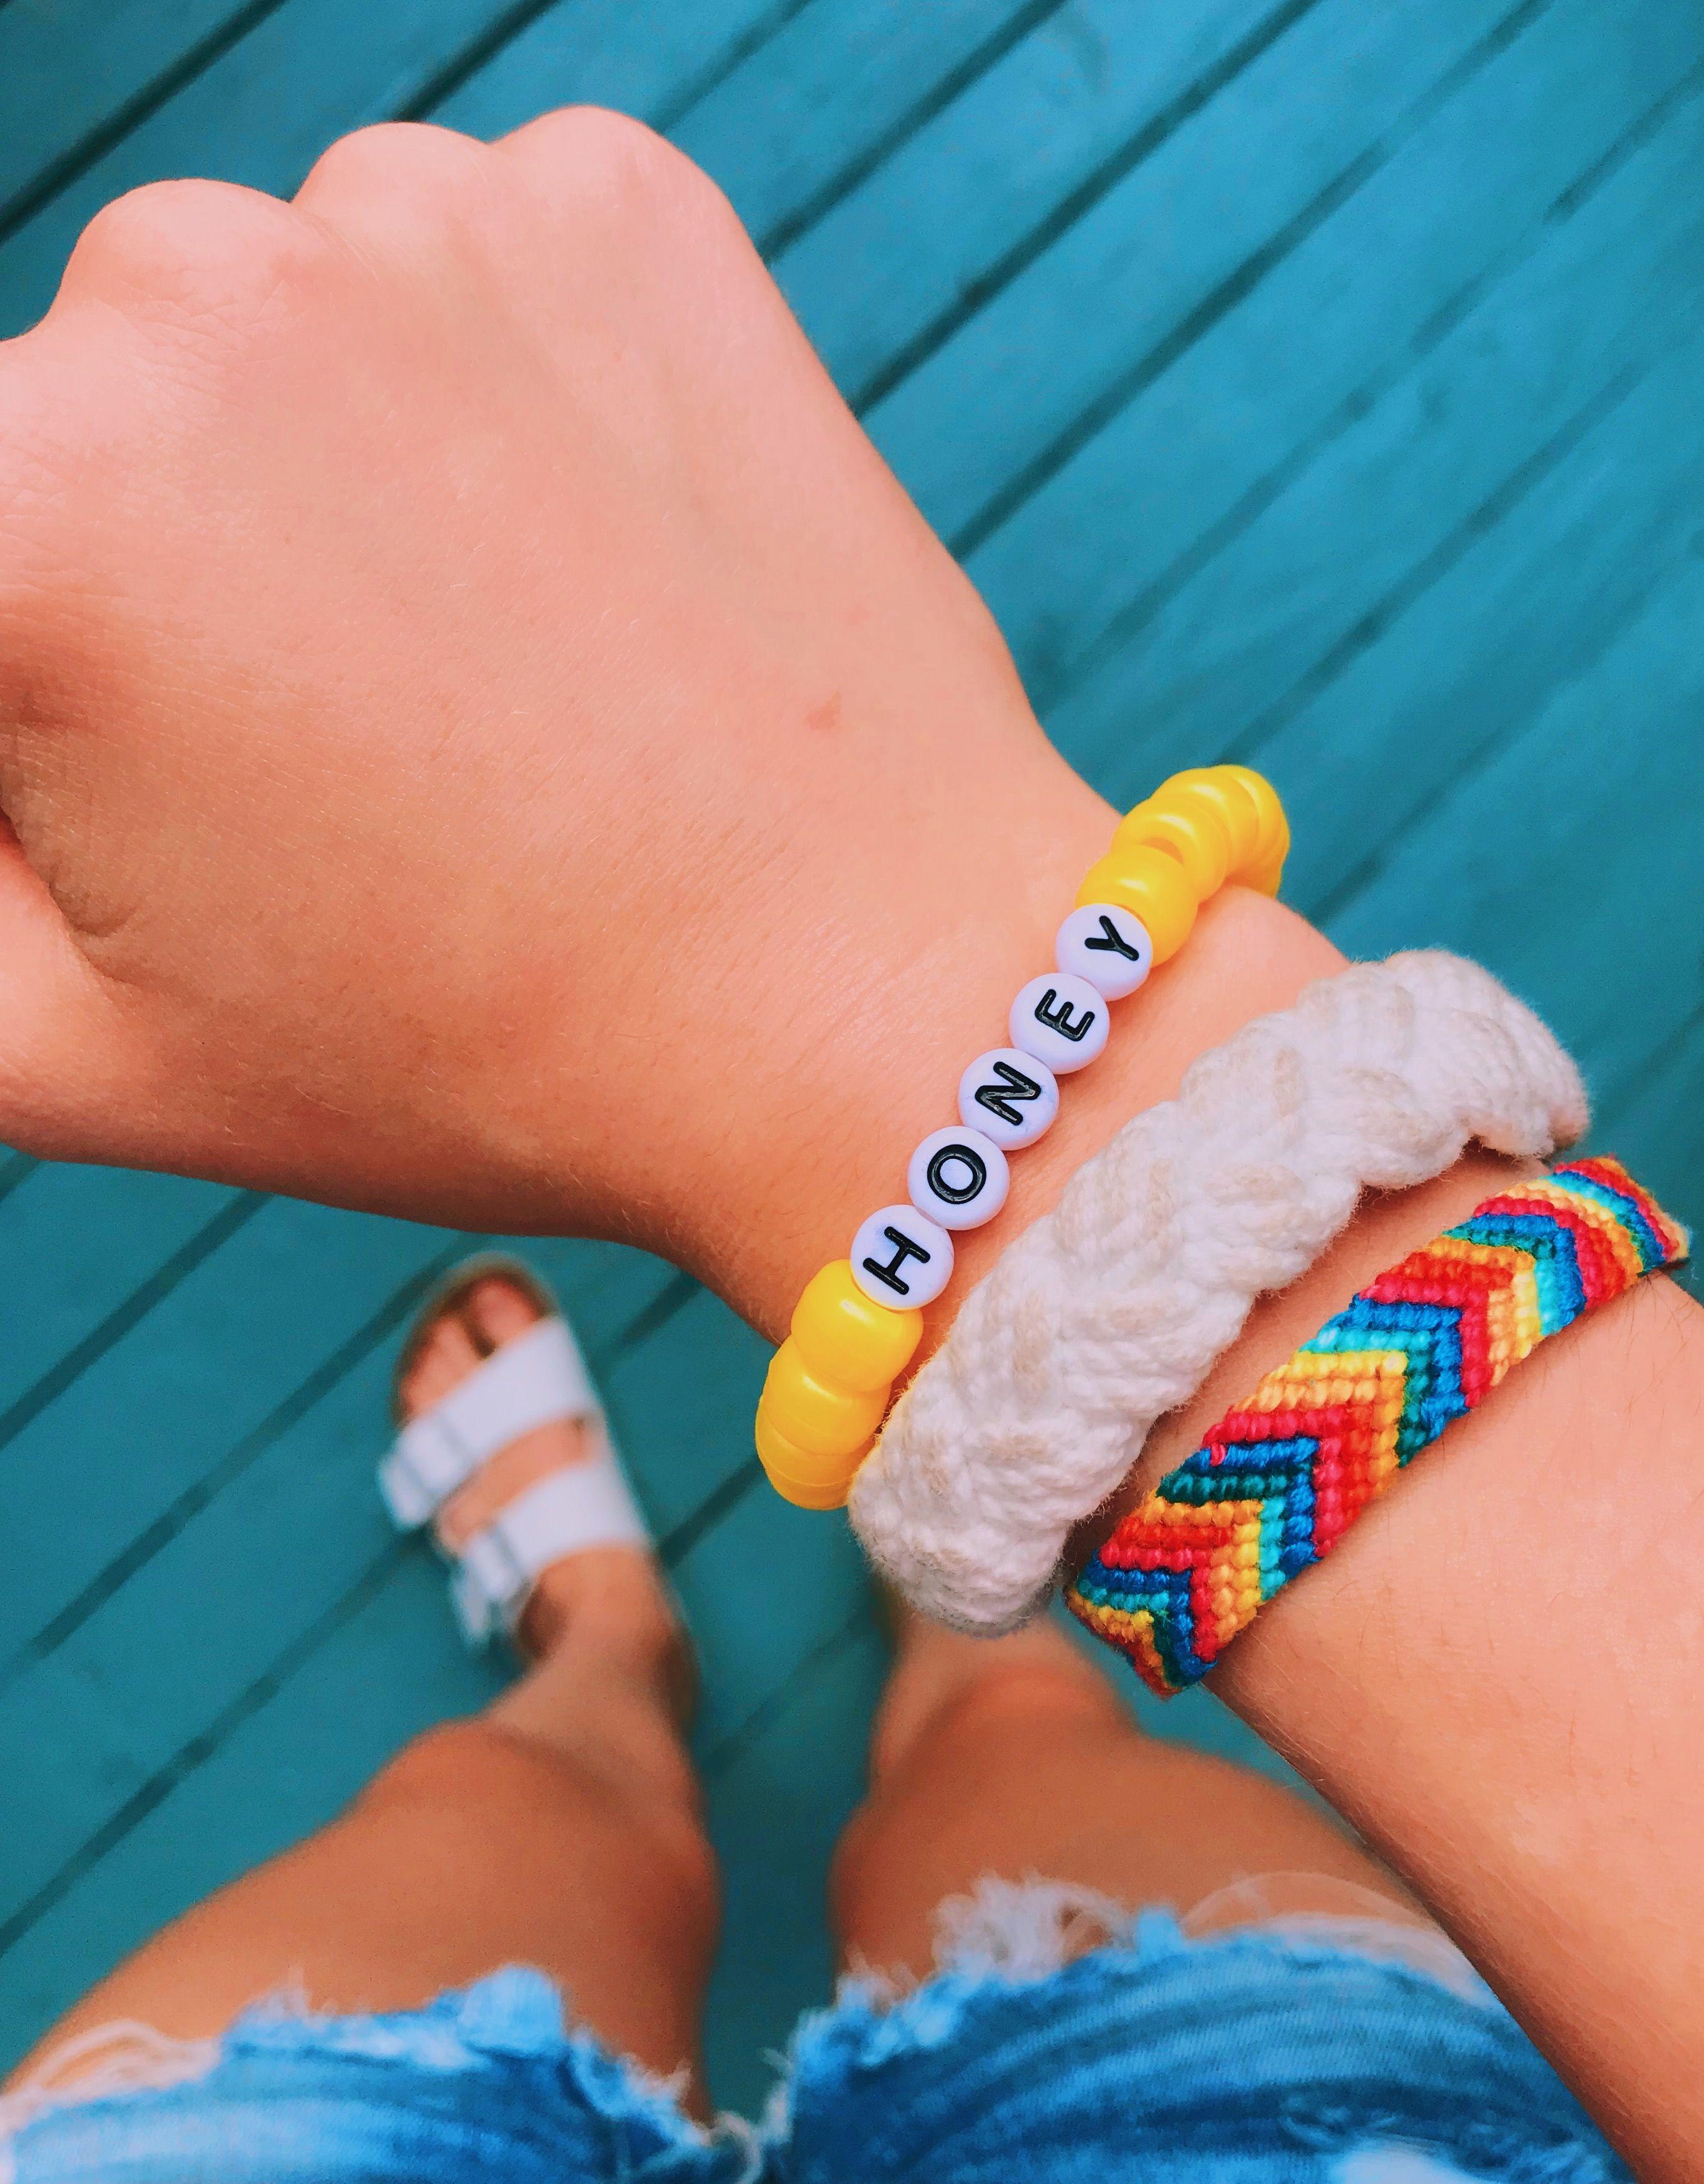 Vsco Bead Bracelets With Words : bracelets, words, Bracelet, Beaded, Braided, Summer, Vsco:, Perrylynn, Pinterest:, Perrylynn1, Things, Pulseras, Kandi,, Bonita…